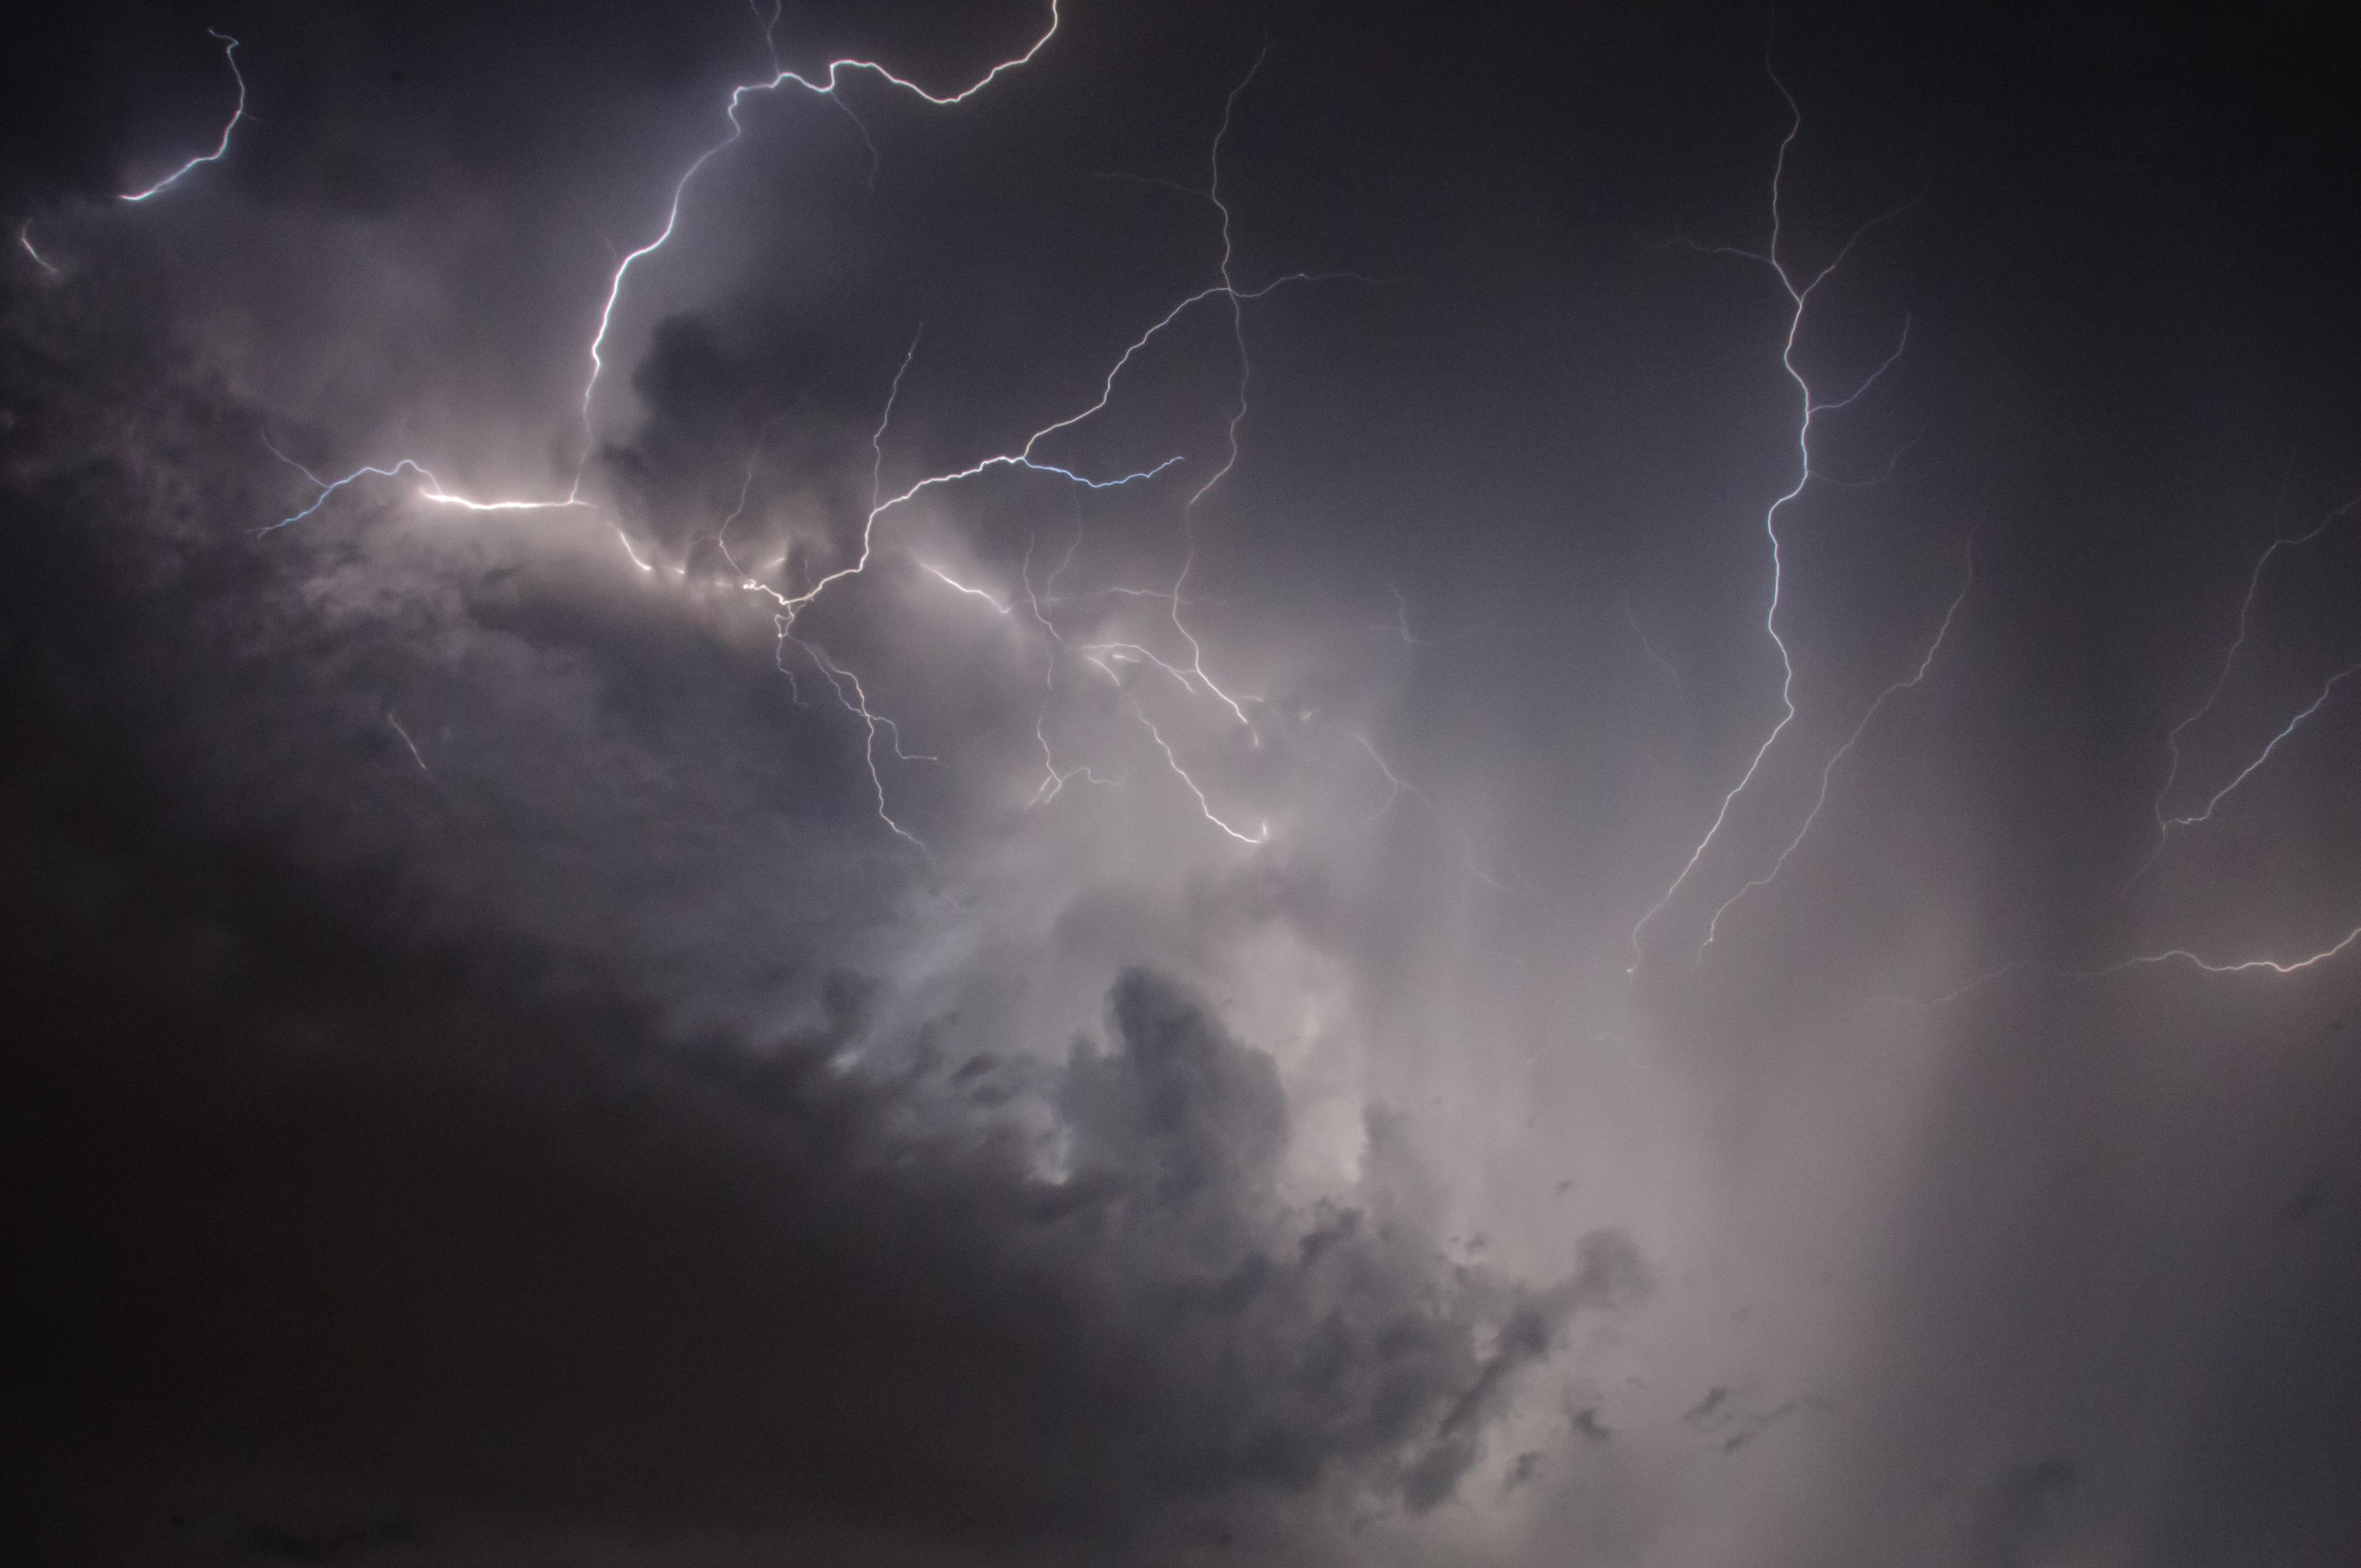 Electricity Atmospheric Discharge